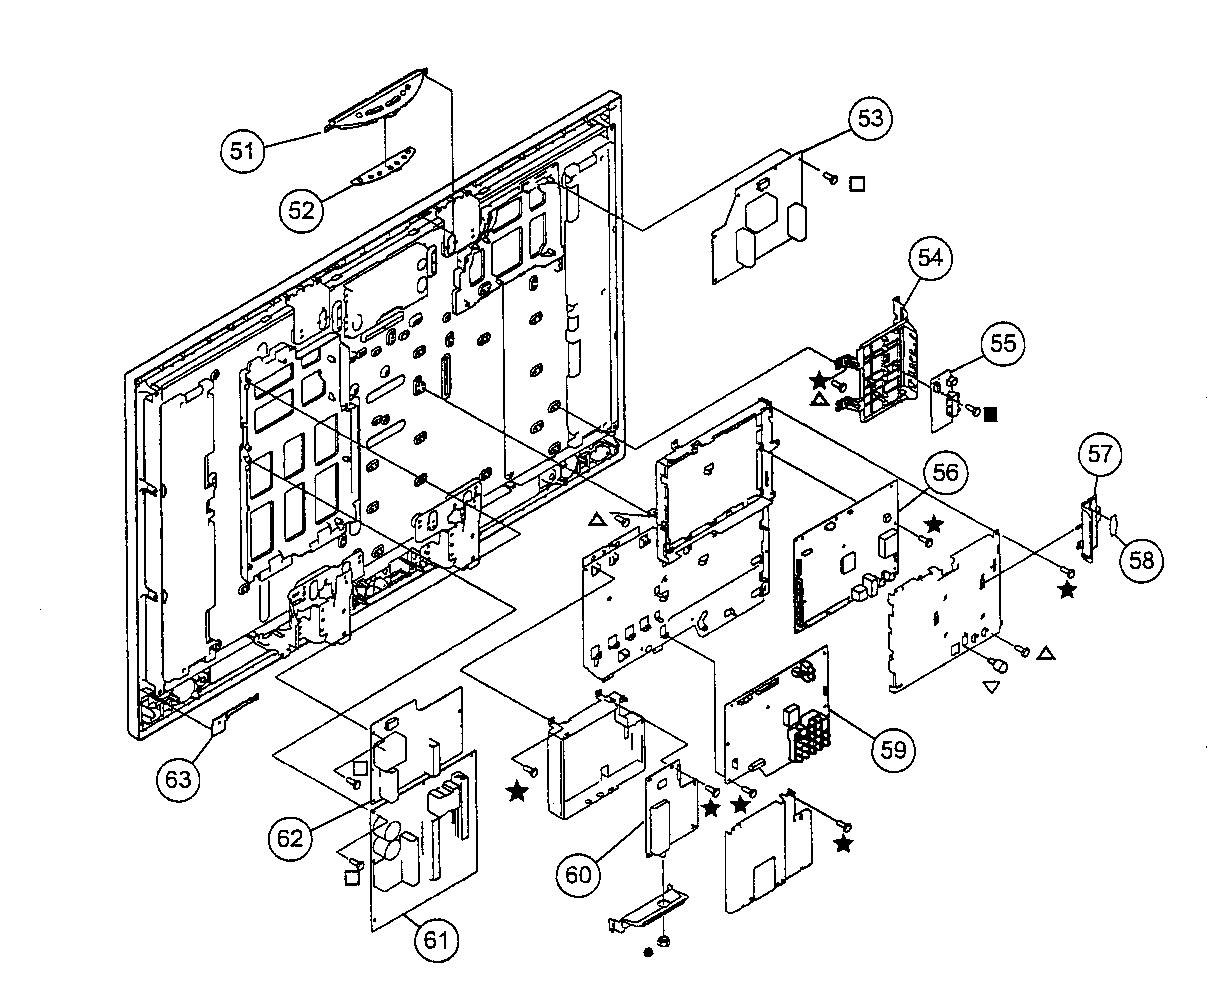 Sony model KDL-46VL130 lcd television genuine parts